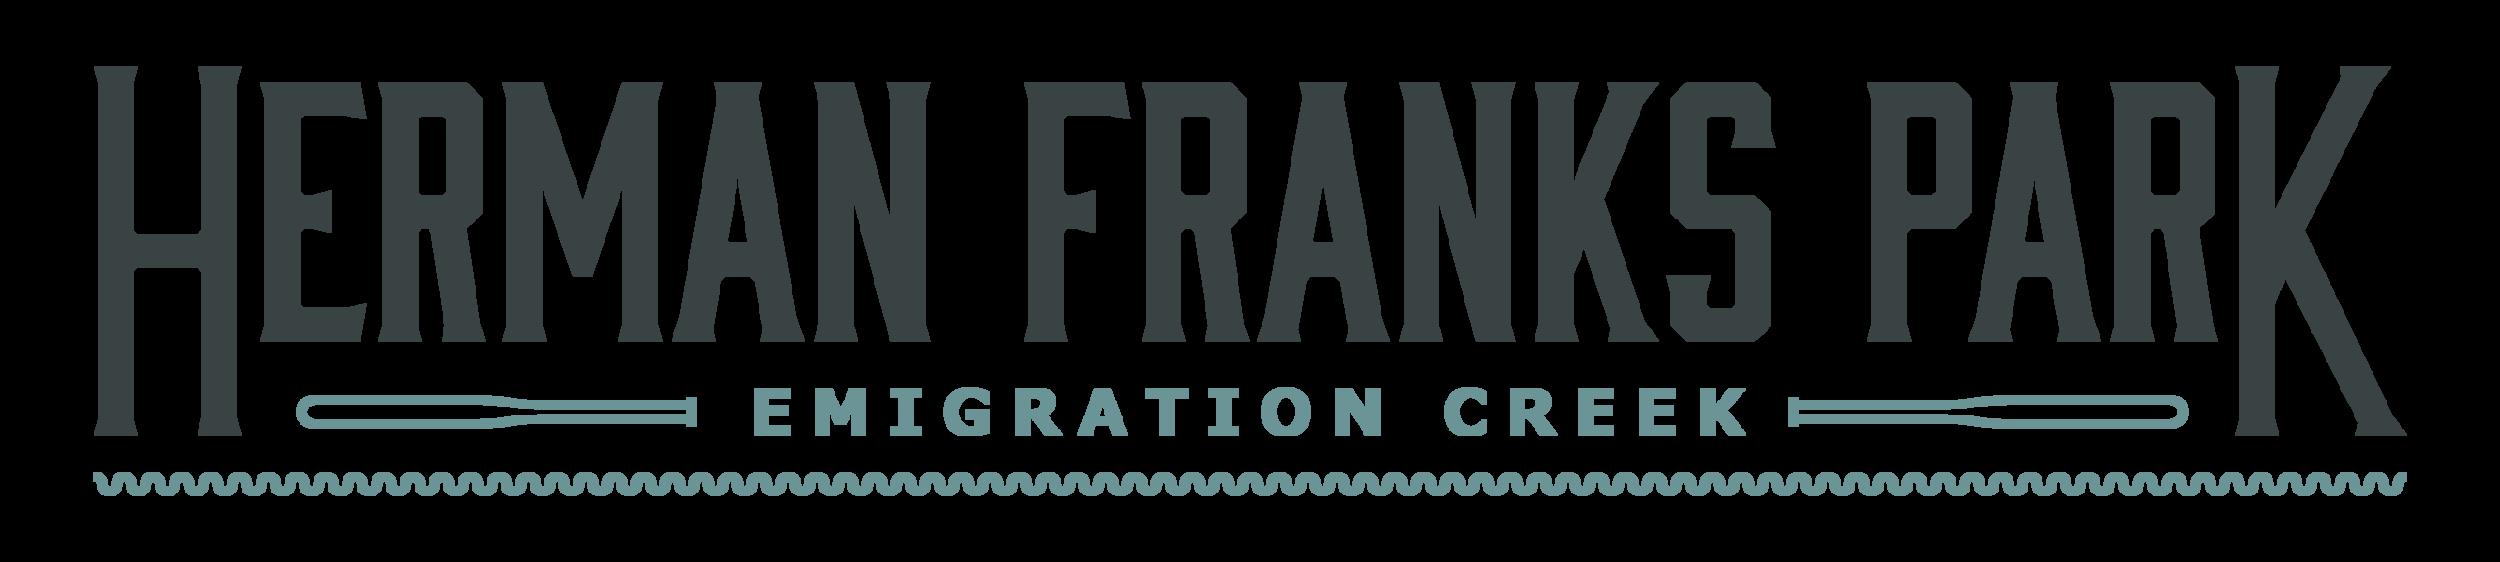 herman_franks_logo-01.png